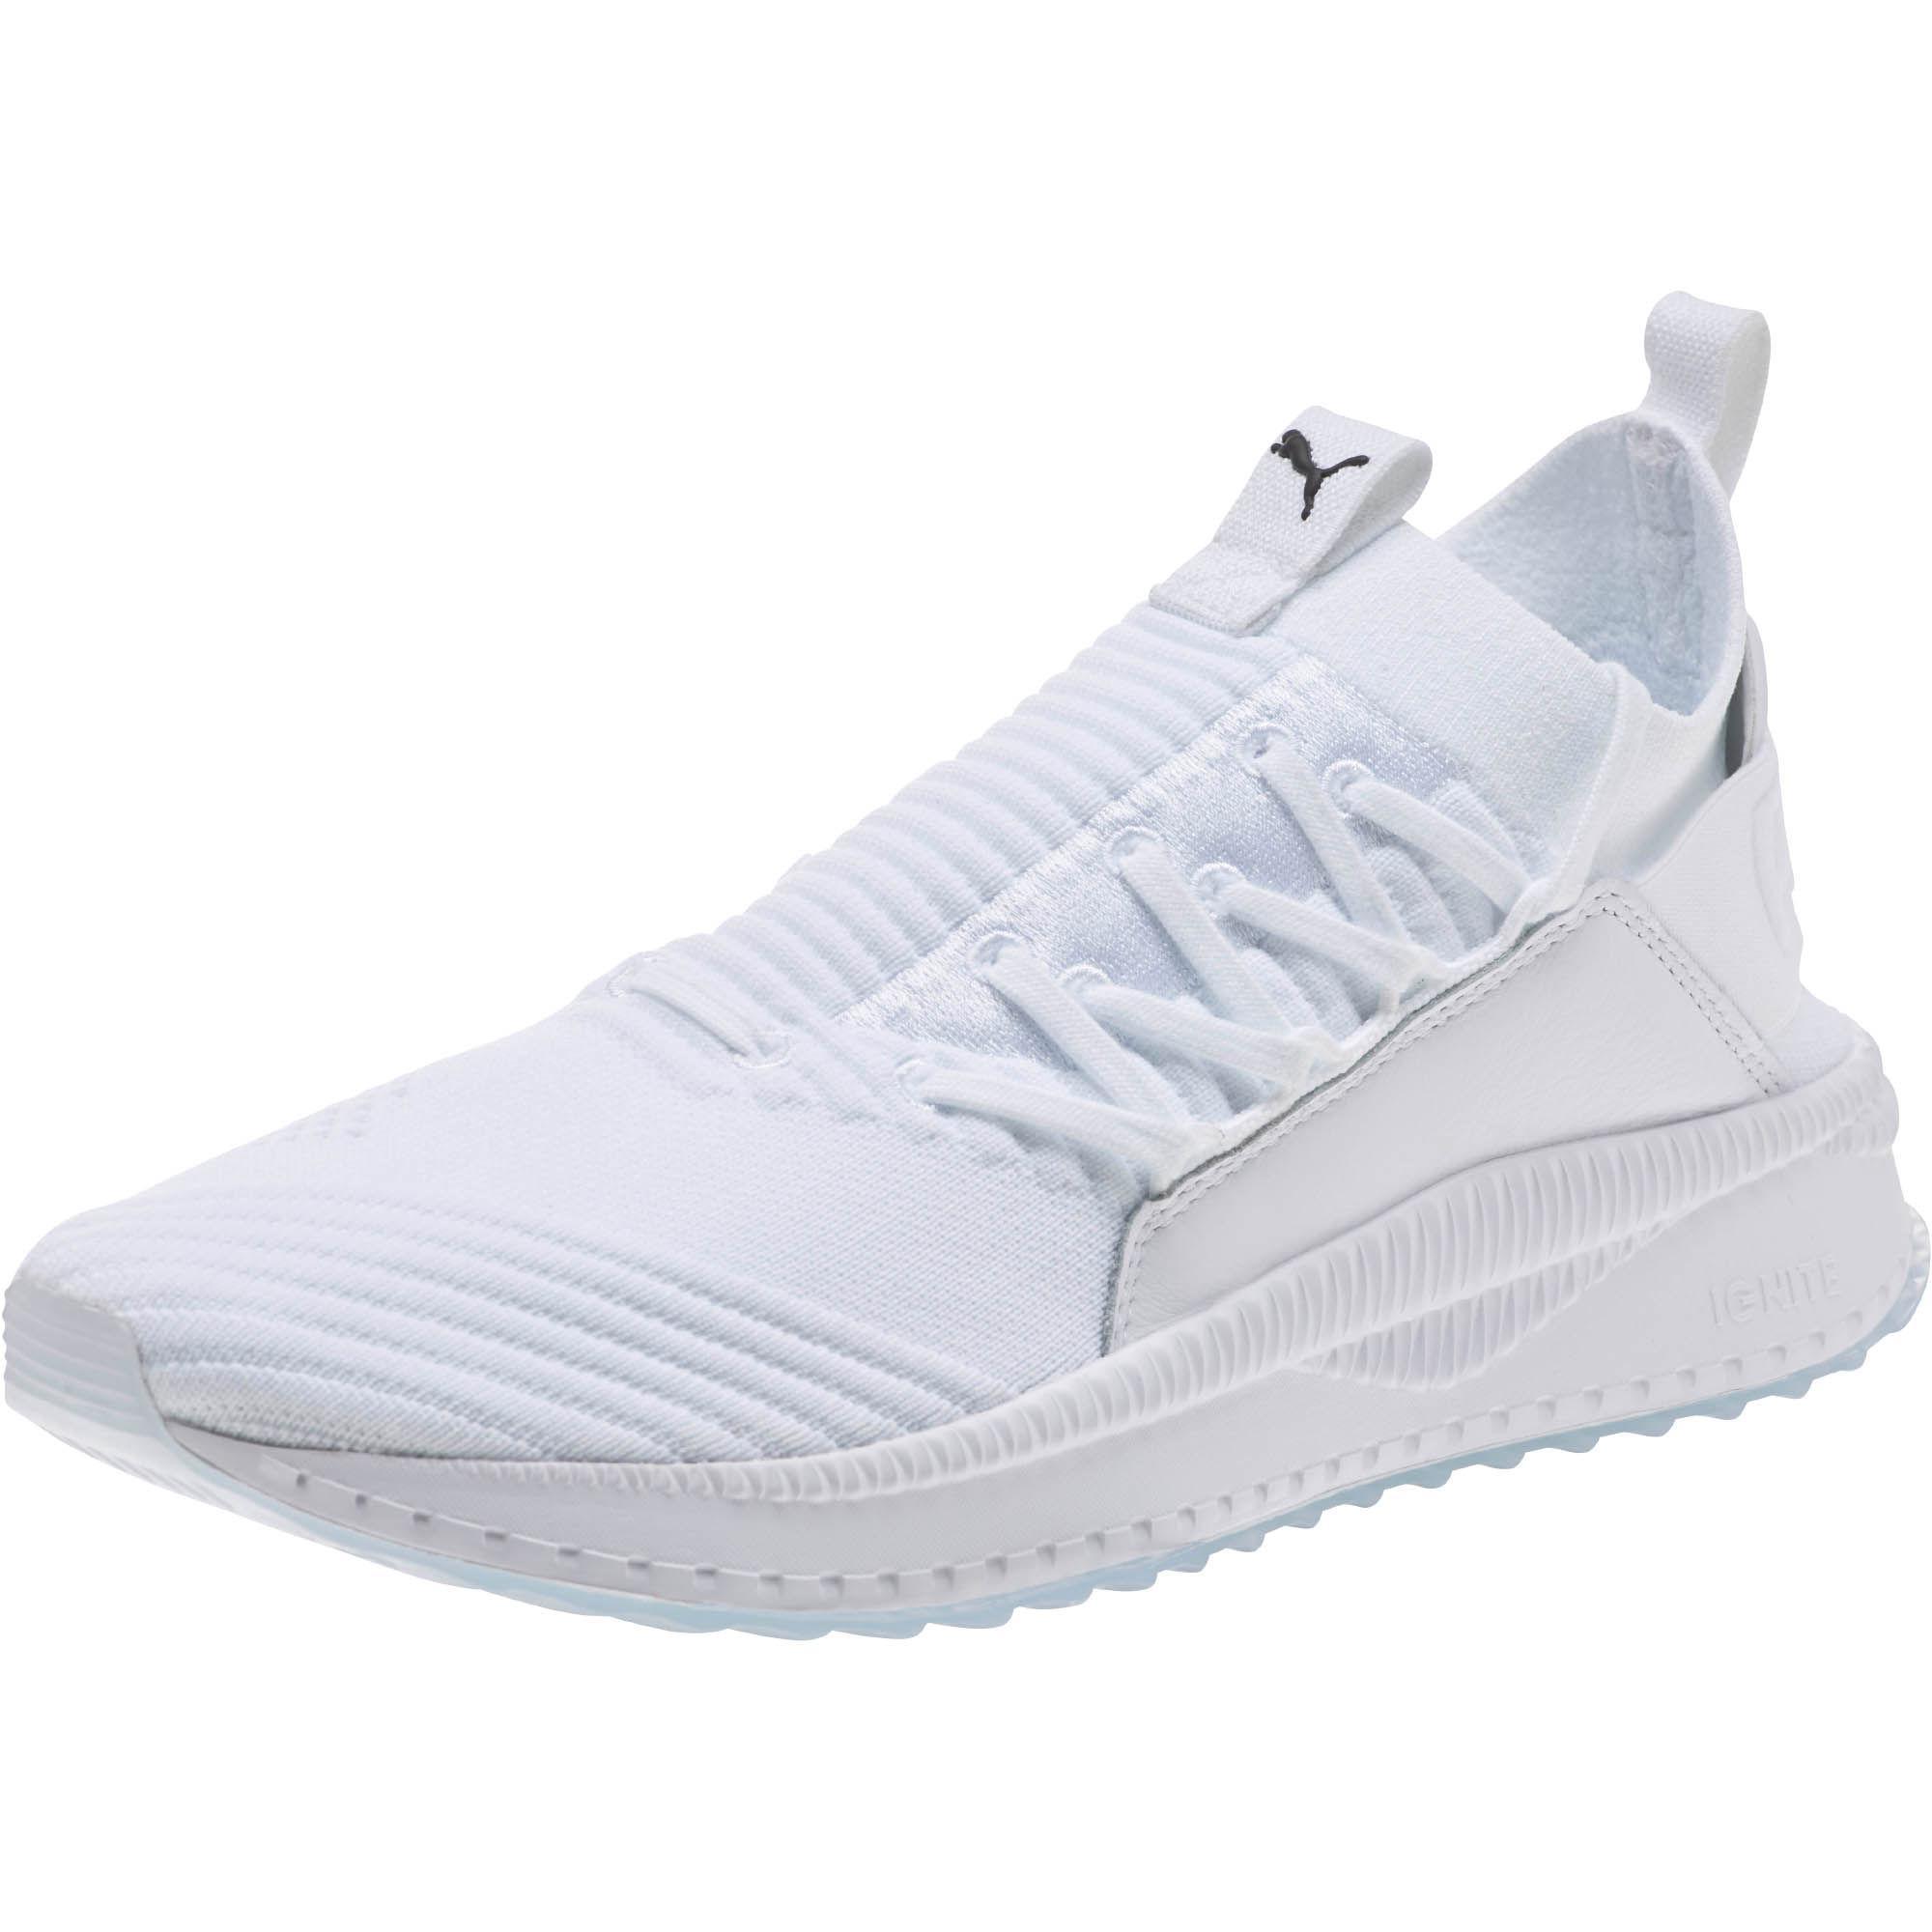 152ddeabfcb Lyst - Puma Tsugi Jun Sneakers in White for Men - Save ...